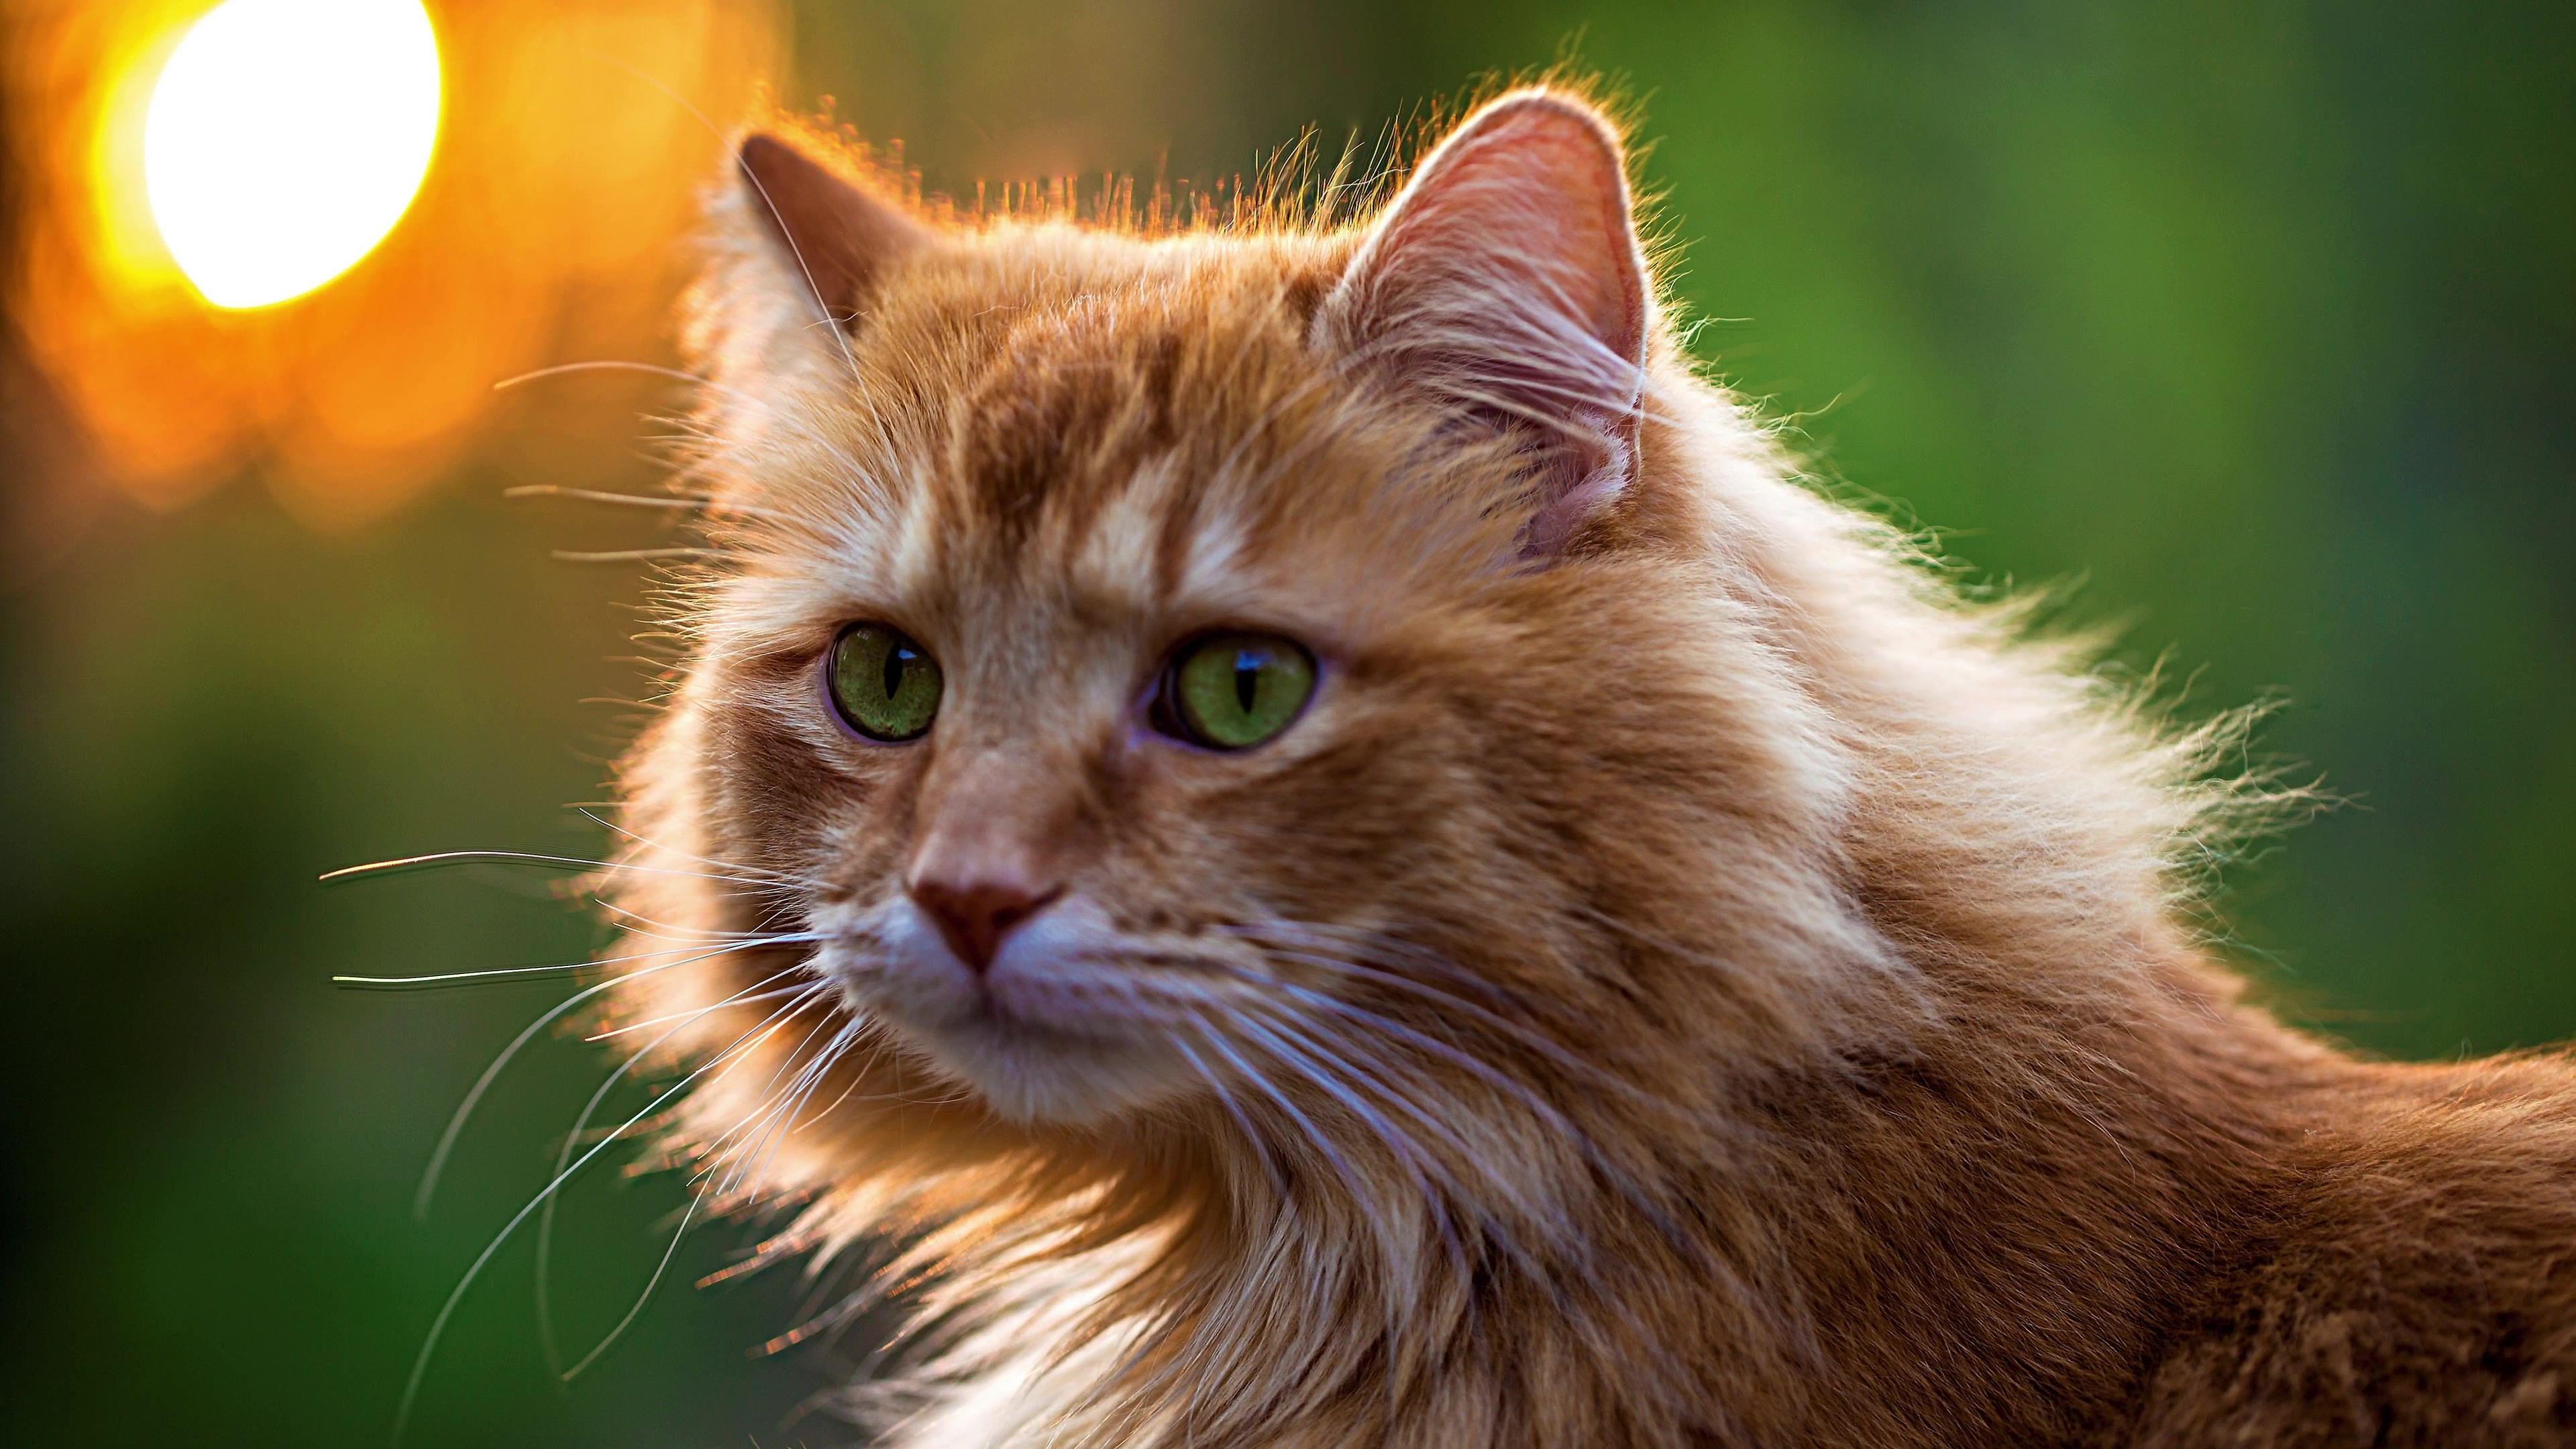 Gatos Cats Salvapantallas Wallpapers HD 4K UHD Ultra High